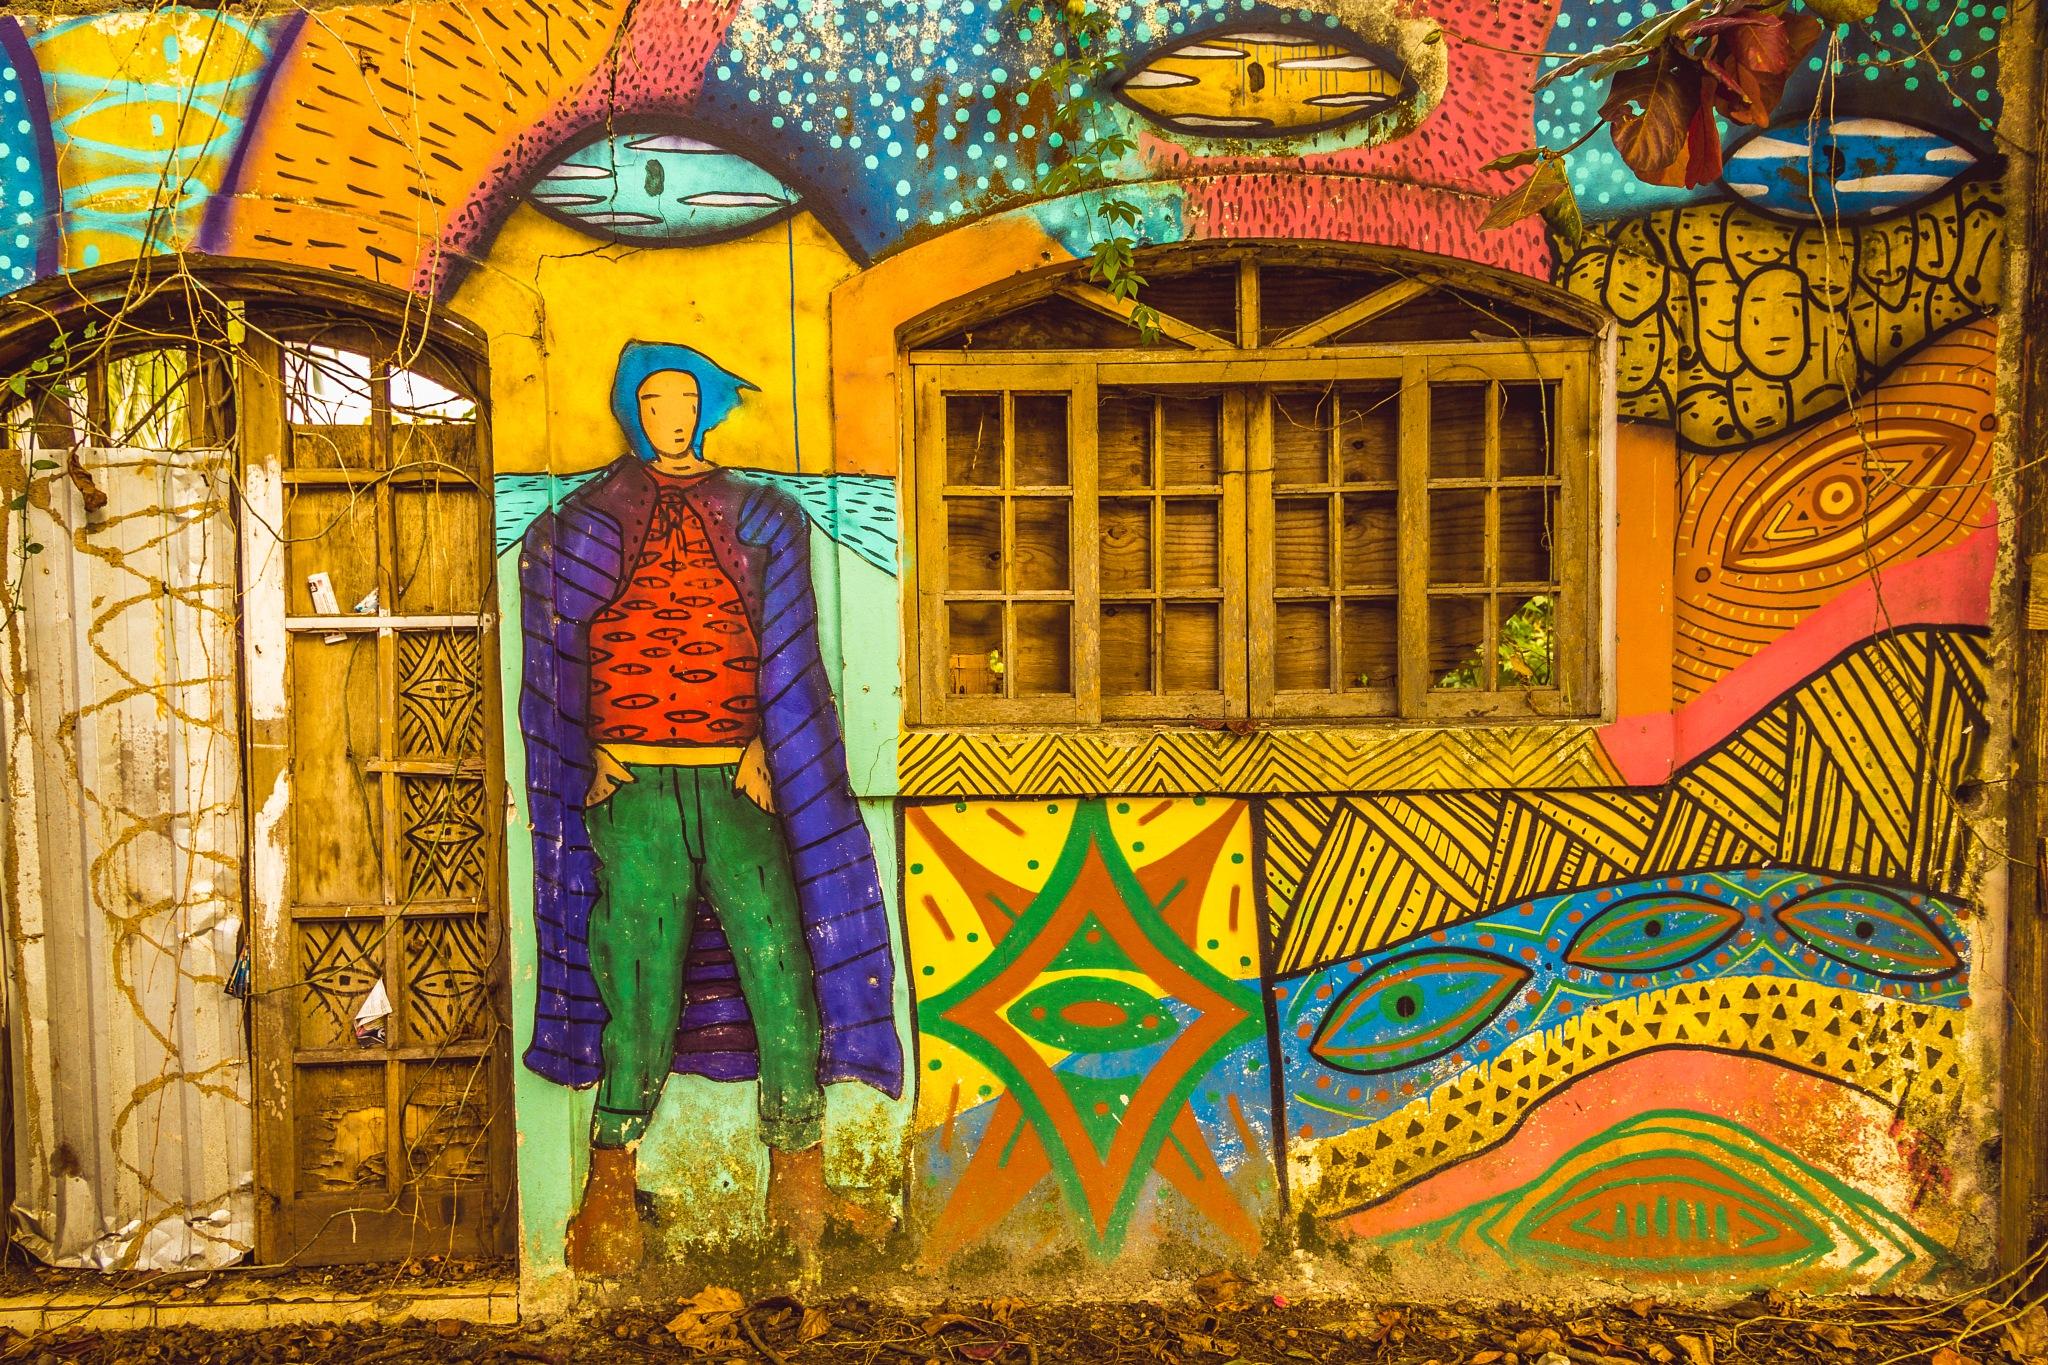 Arte largada na rua by Millepez Etzel